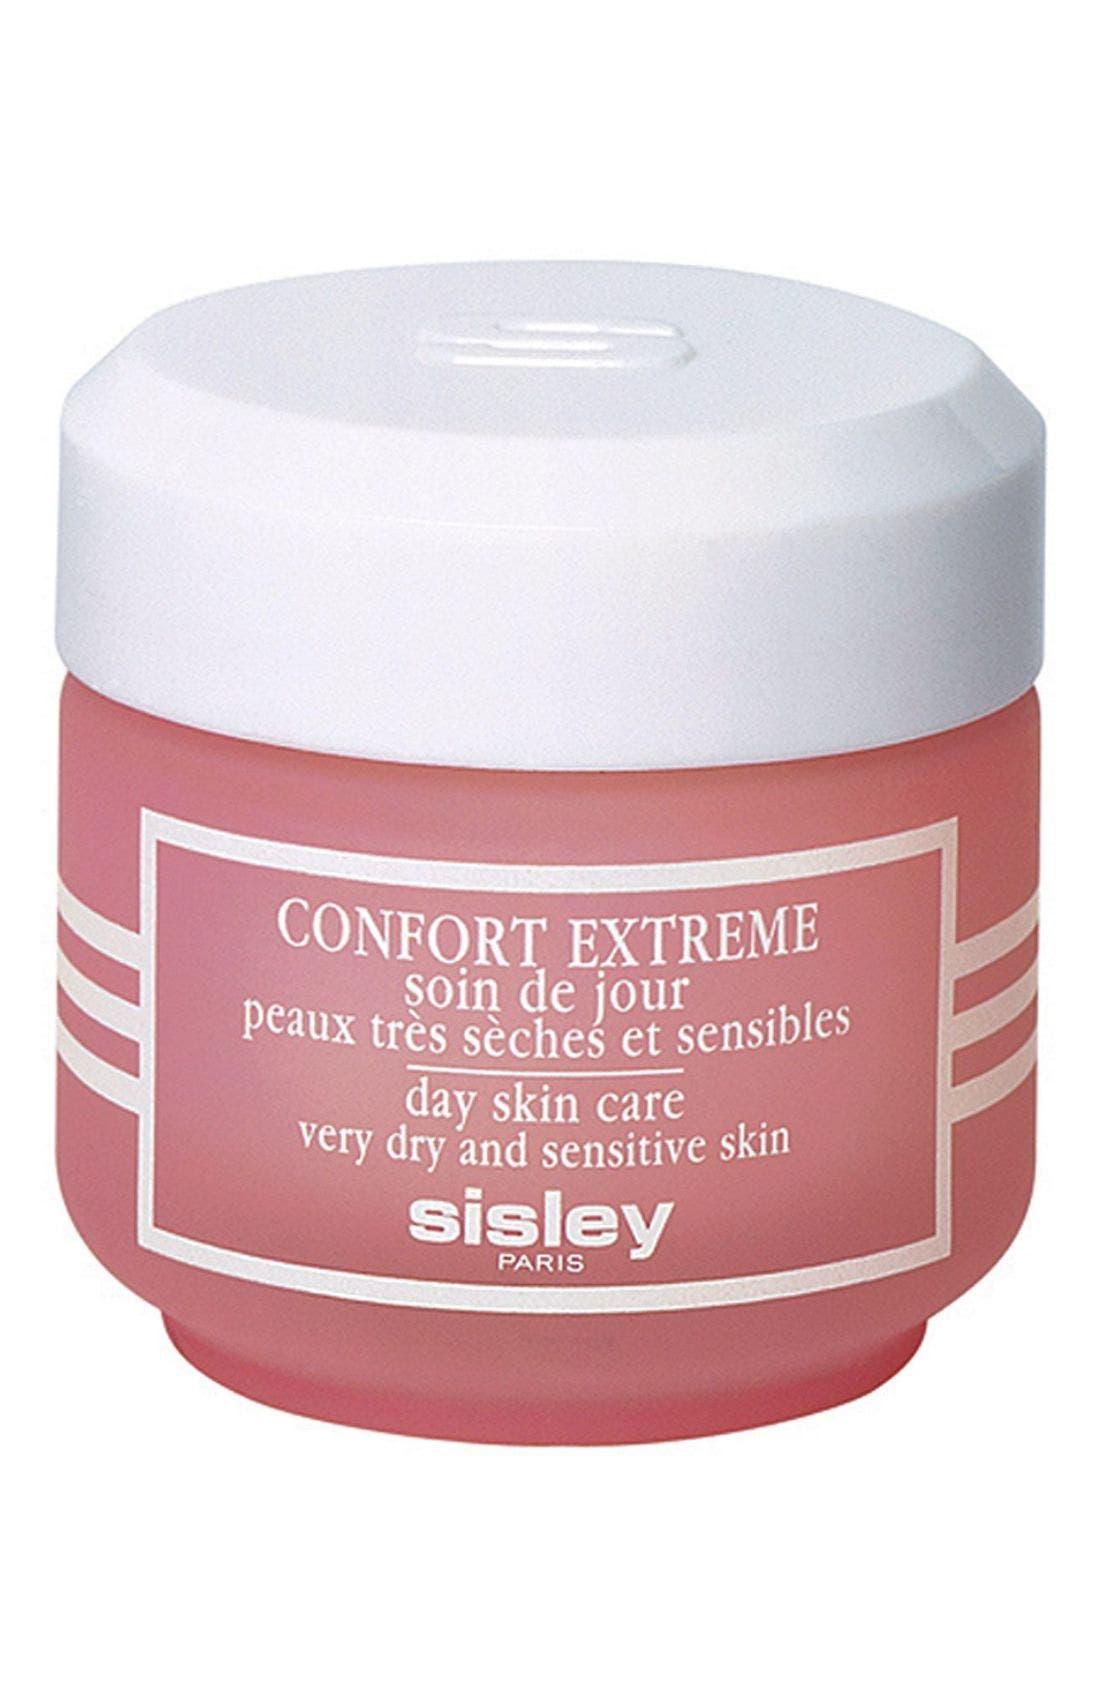 Sisley Paris Confort Extreme Day Skincare